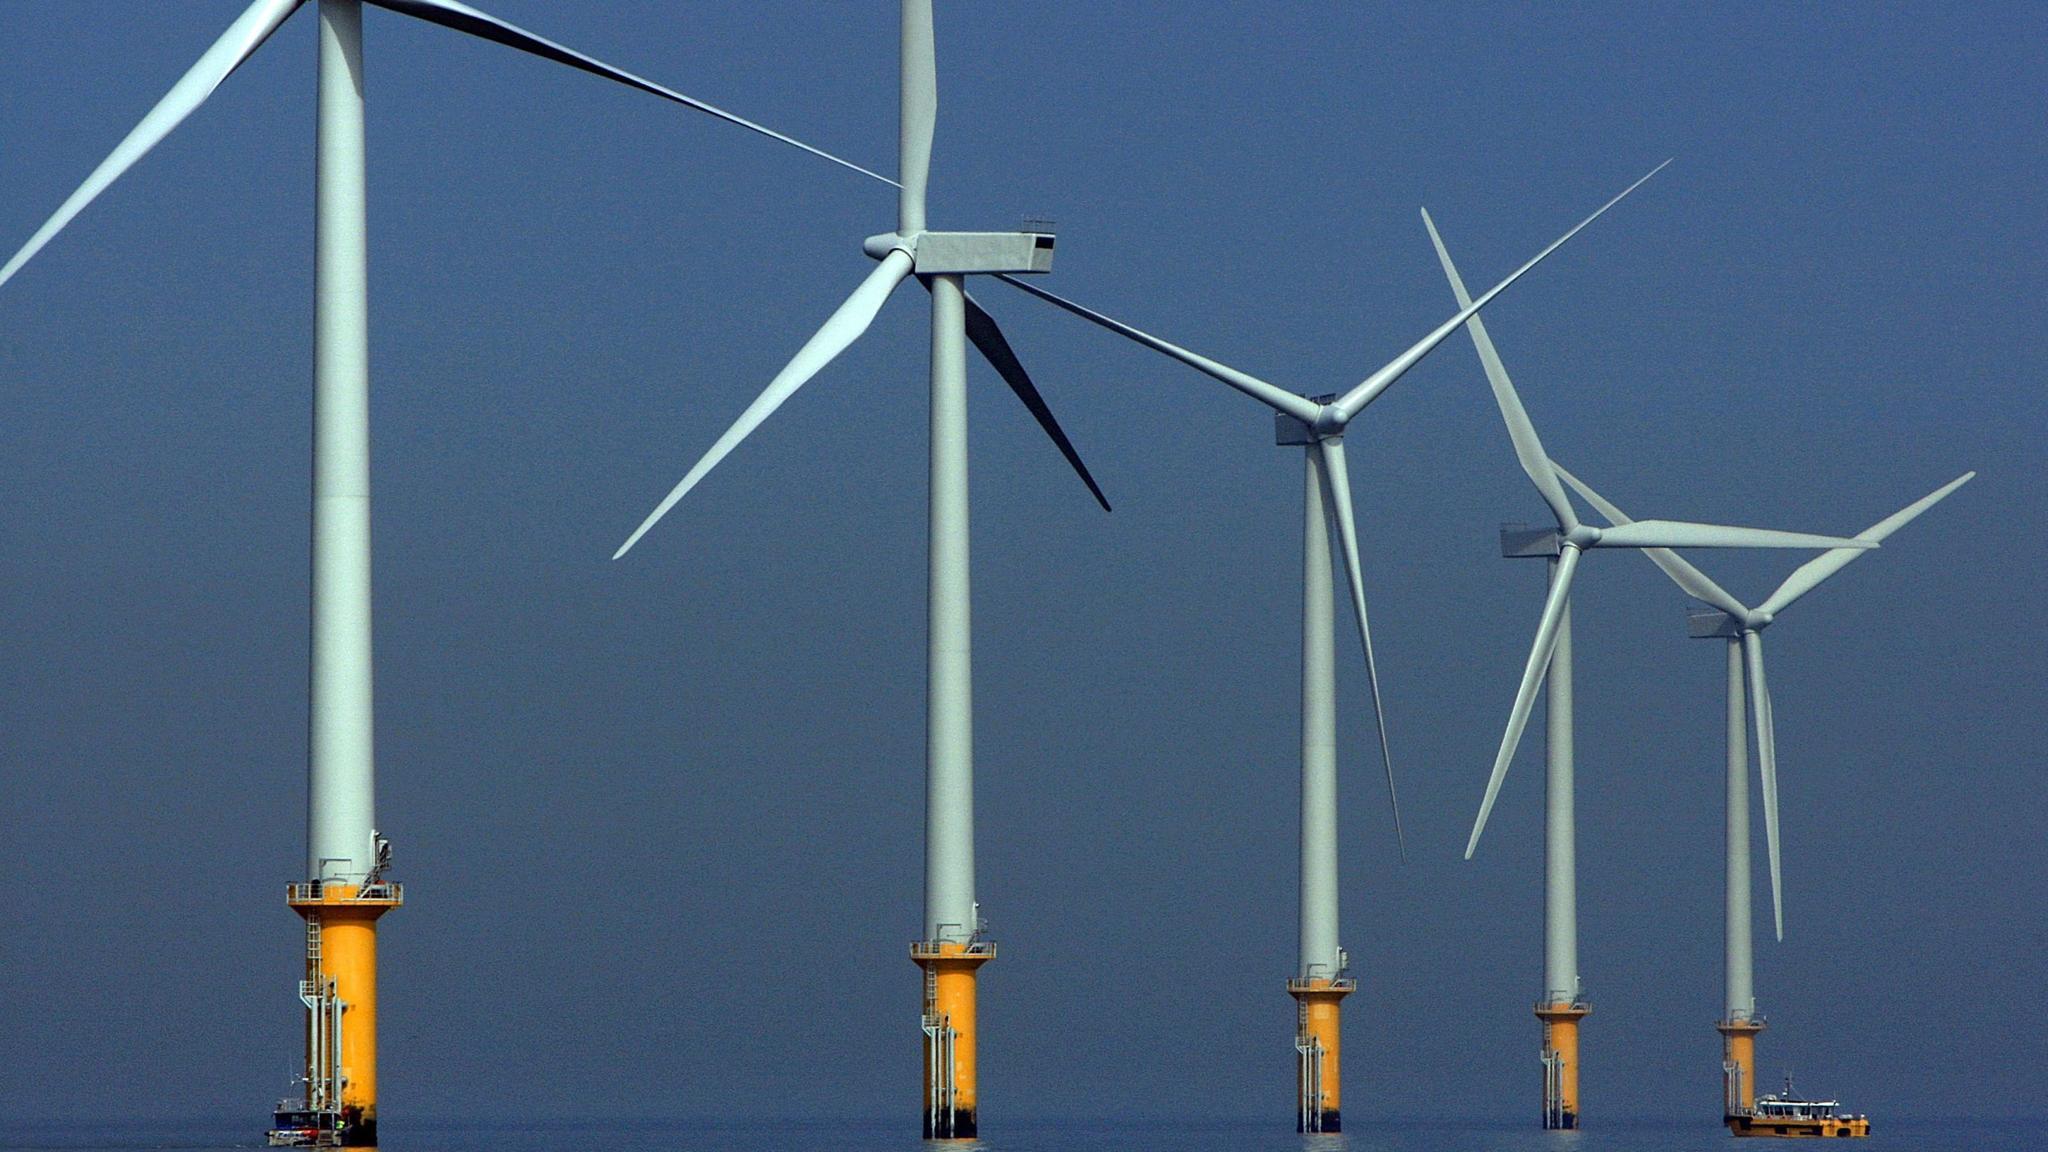 UK energy groups warn subsidy cuts threaten old wind farms